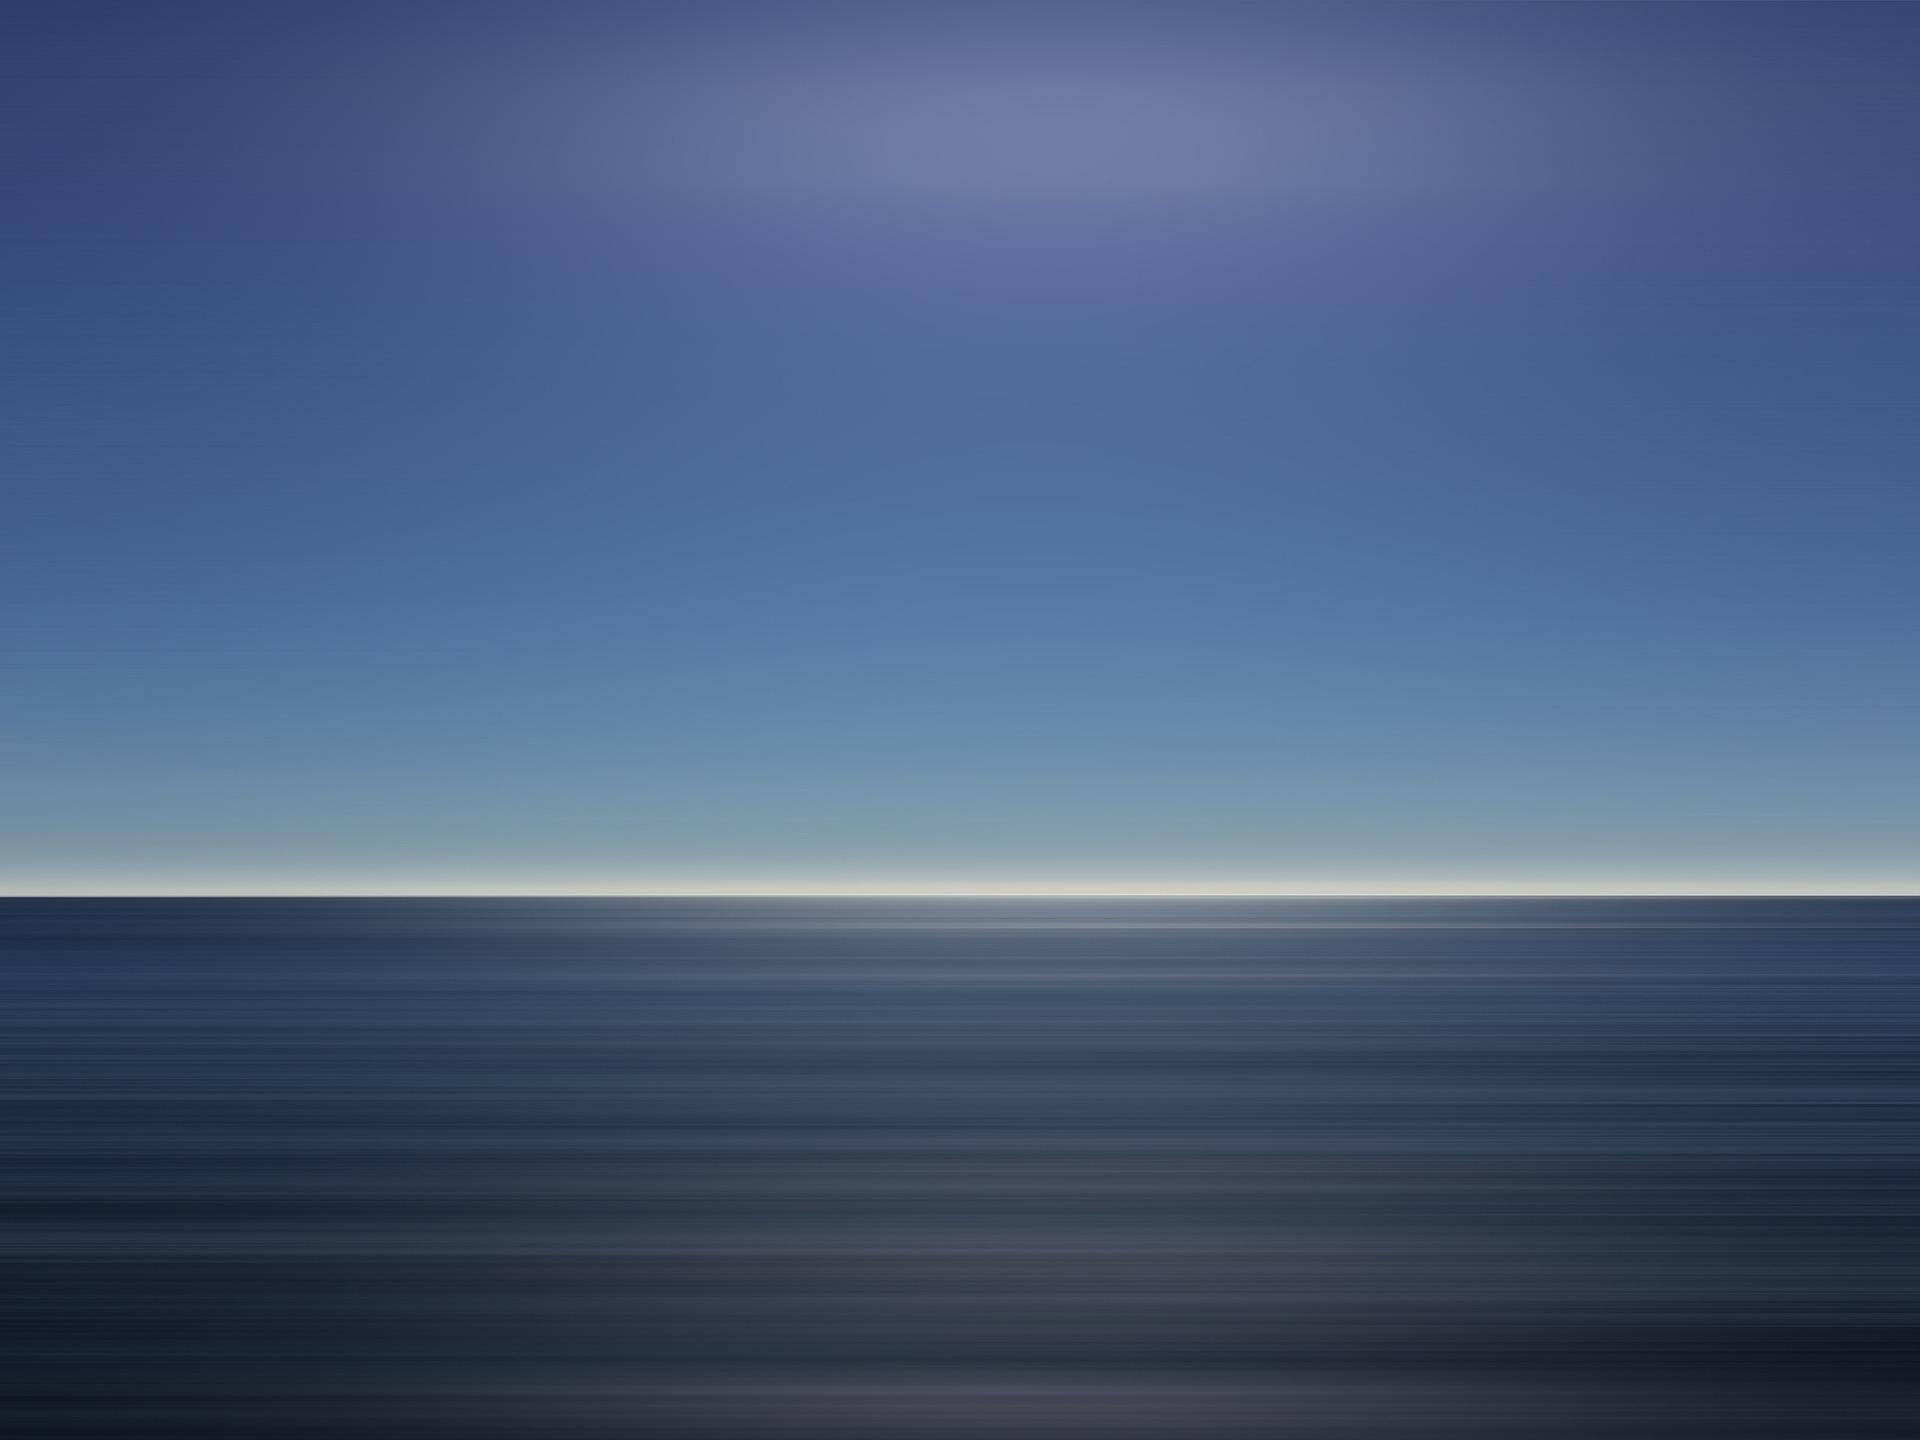 ocean-828774_1920